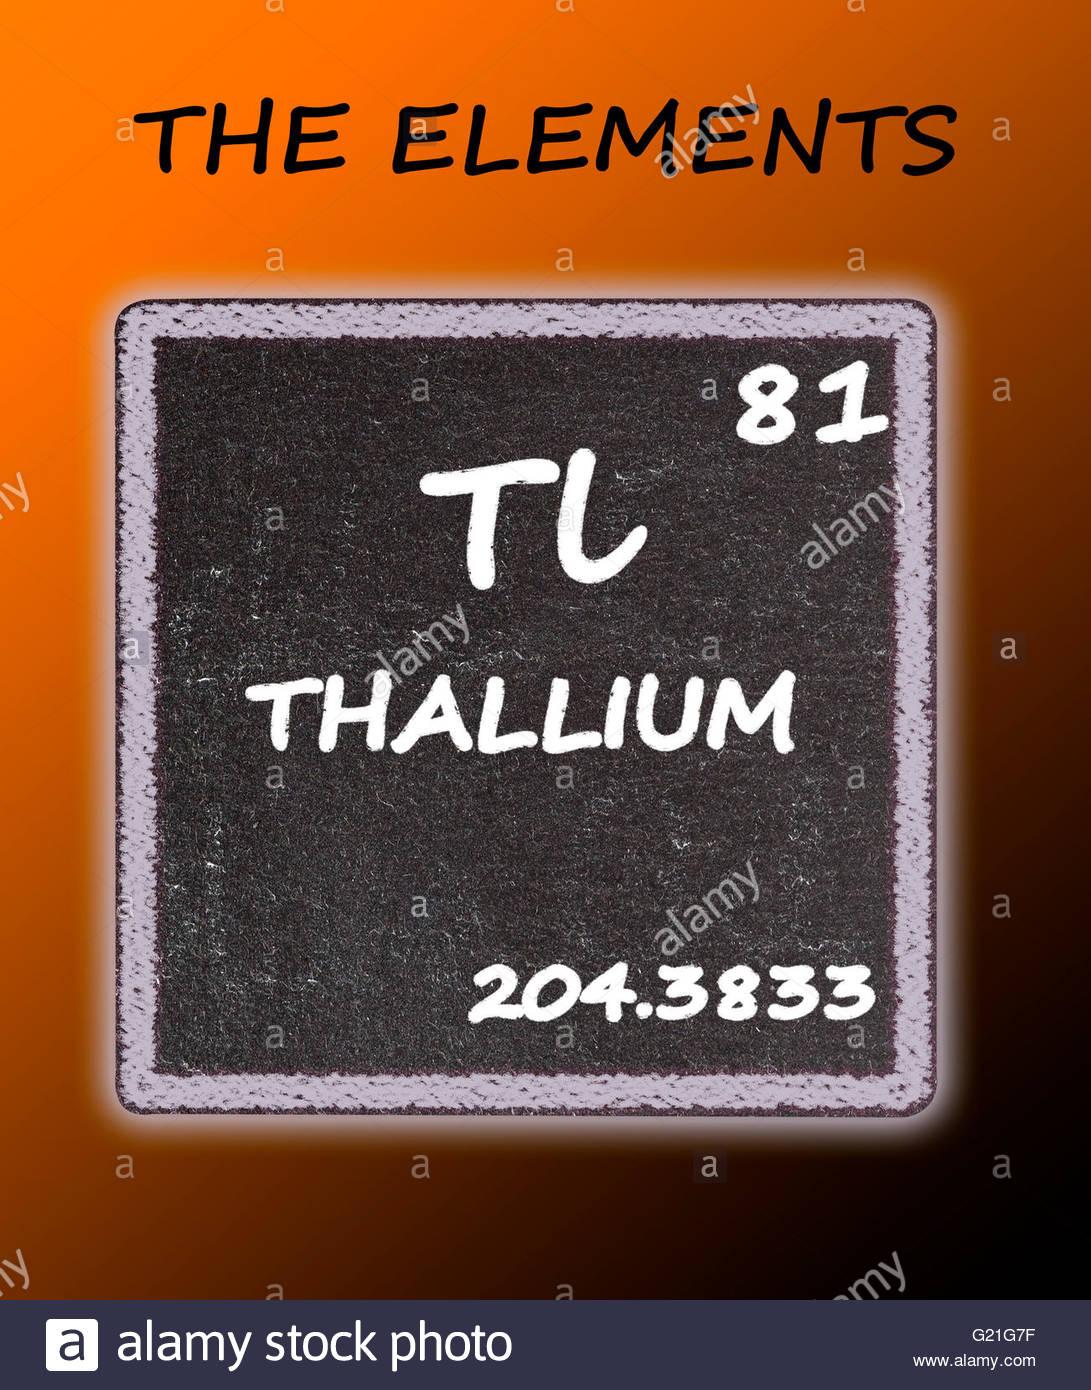 Thallium Details From Periodic Table Stock Photos Thallium Details